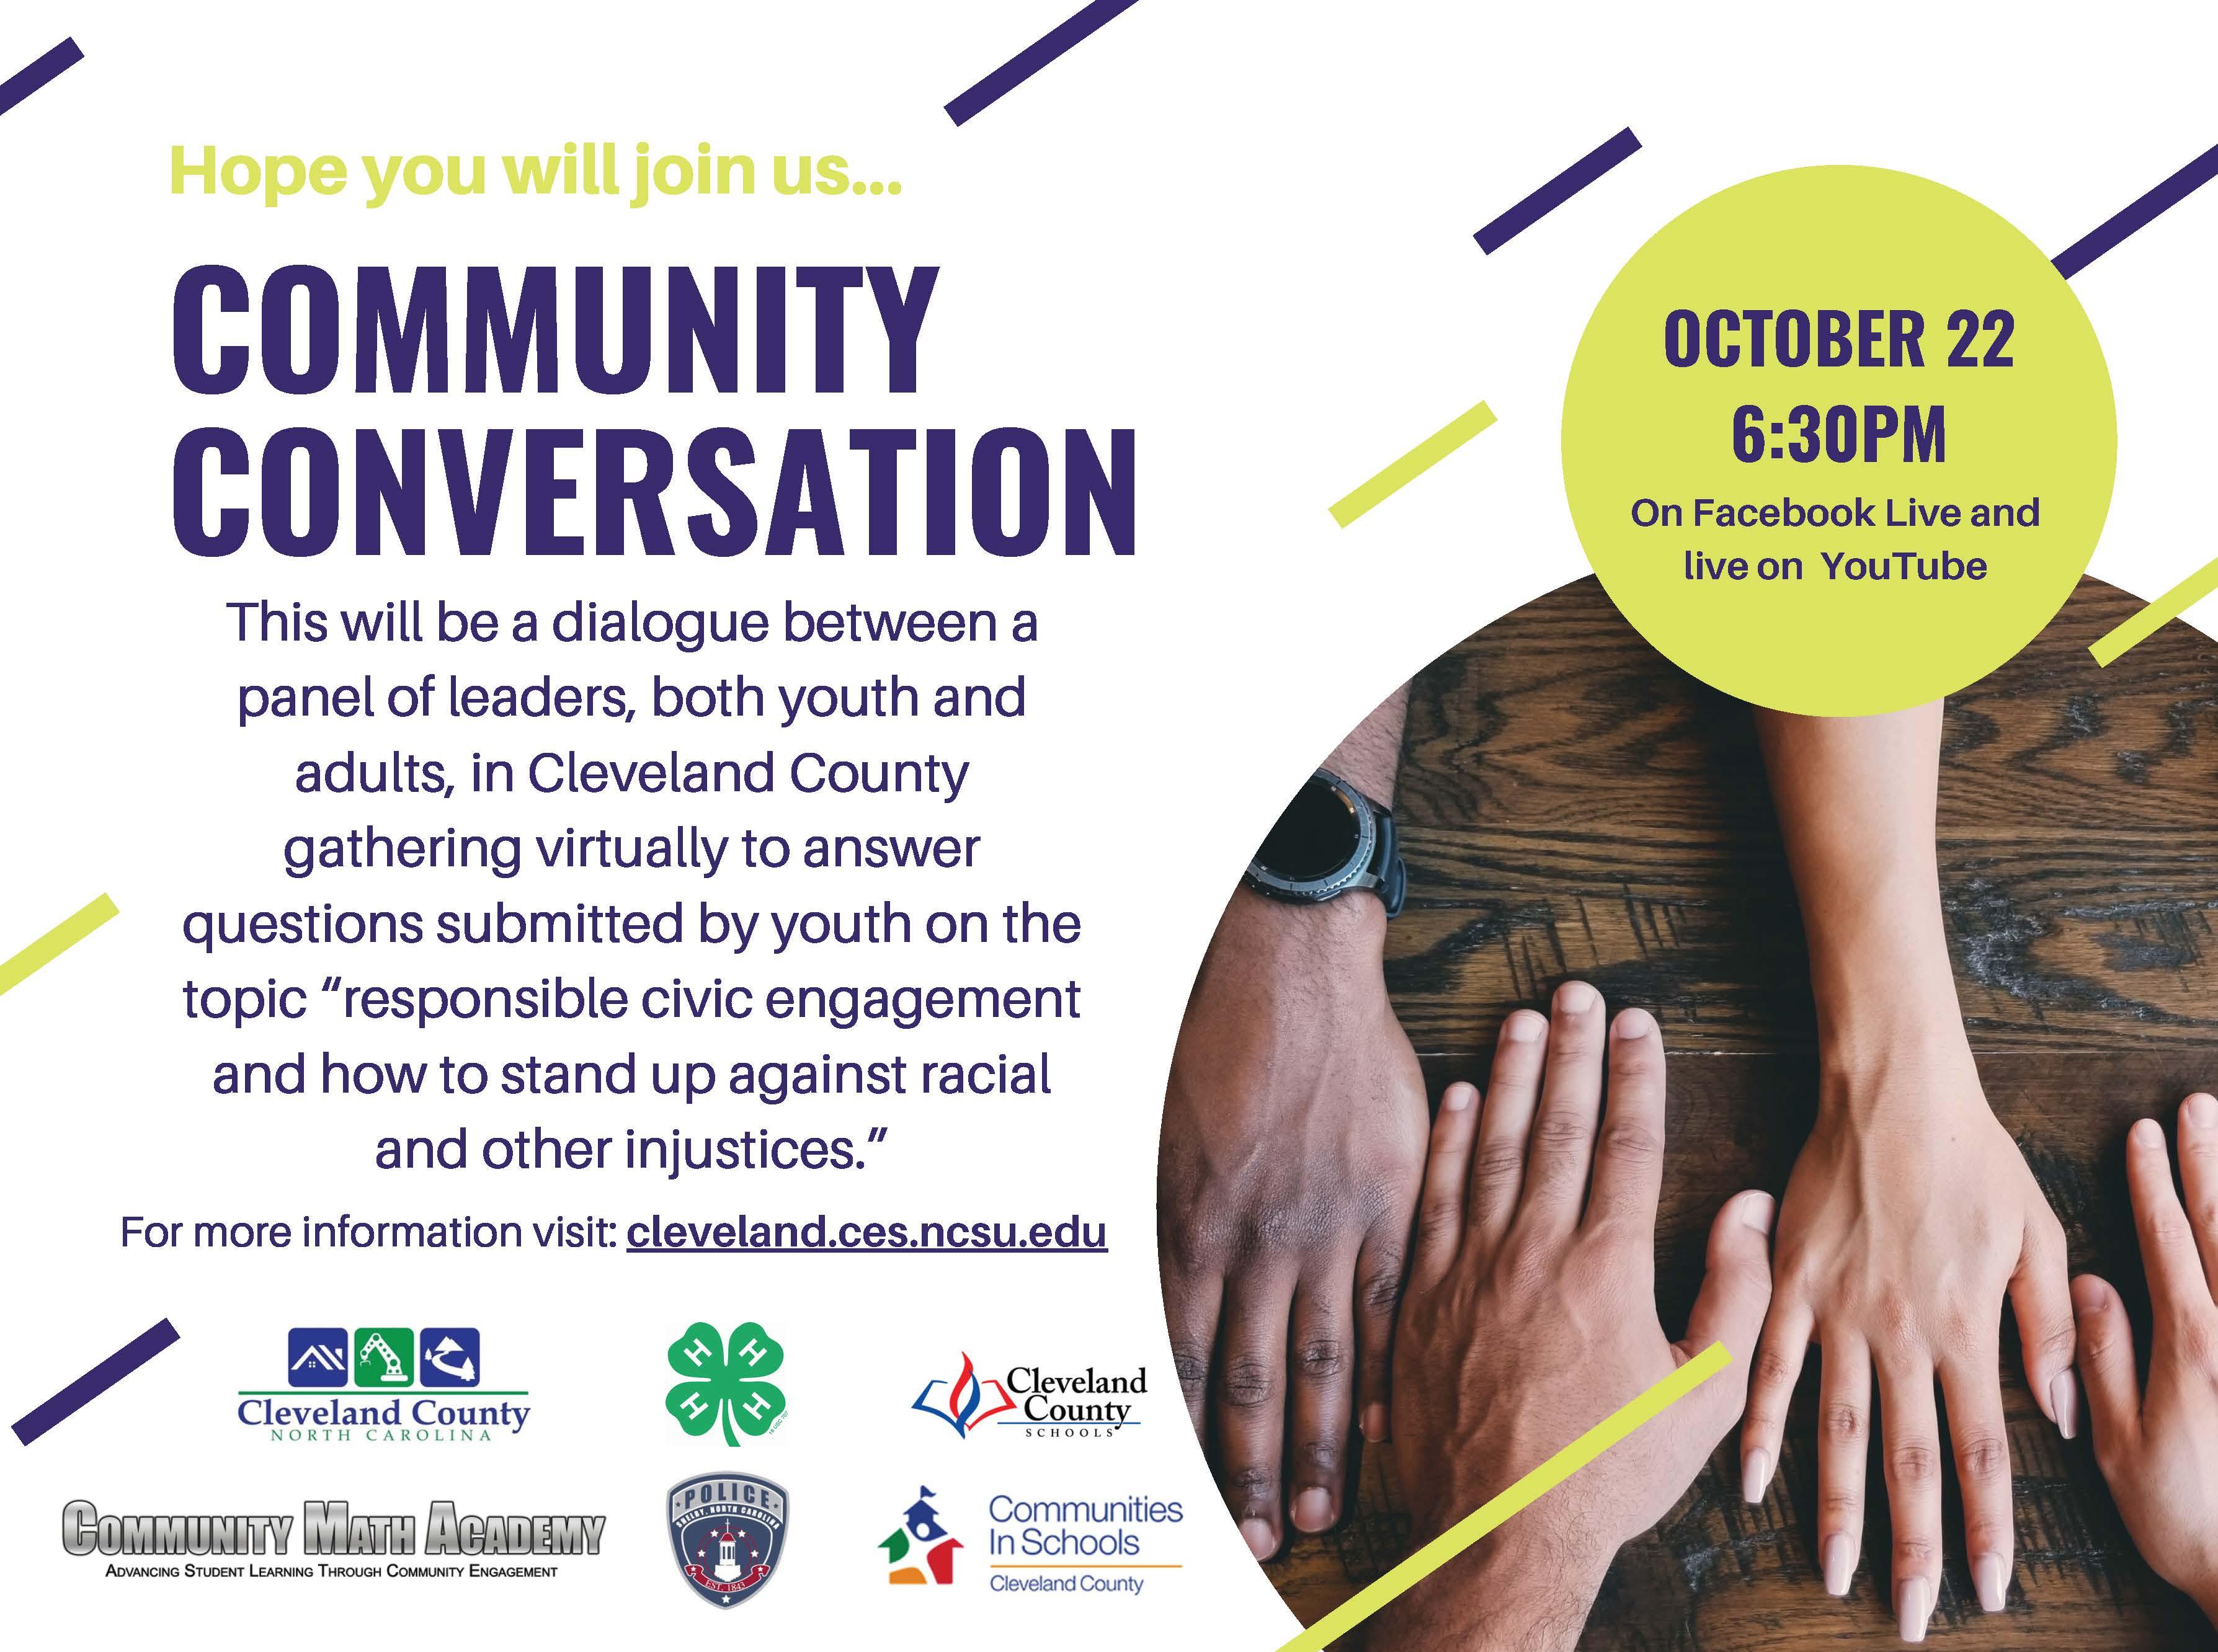 Community Conversation Event Flyer